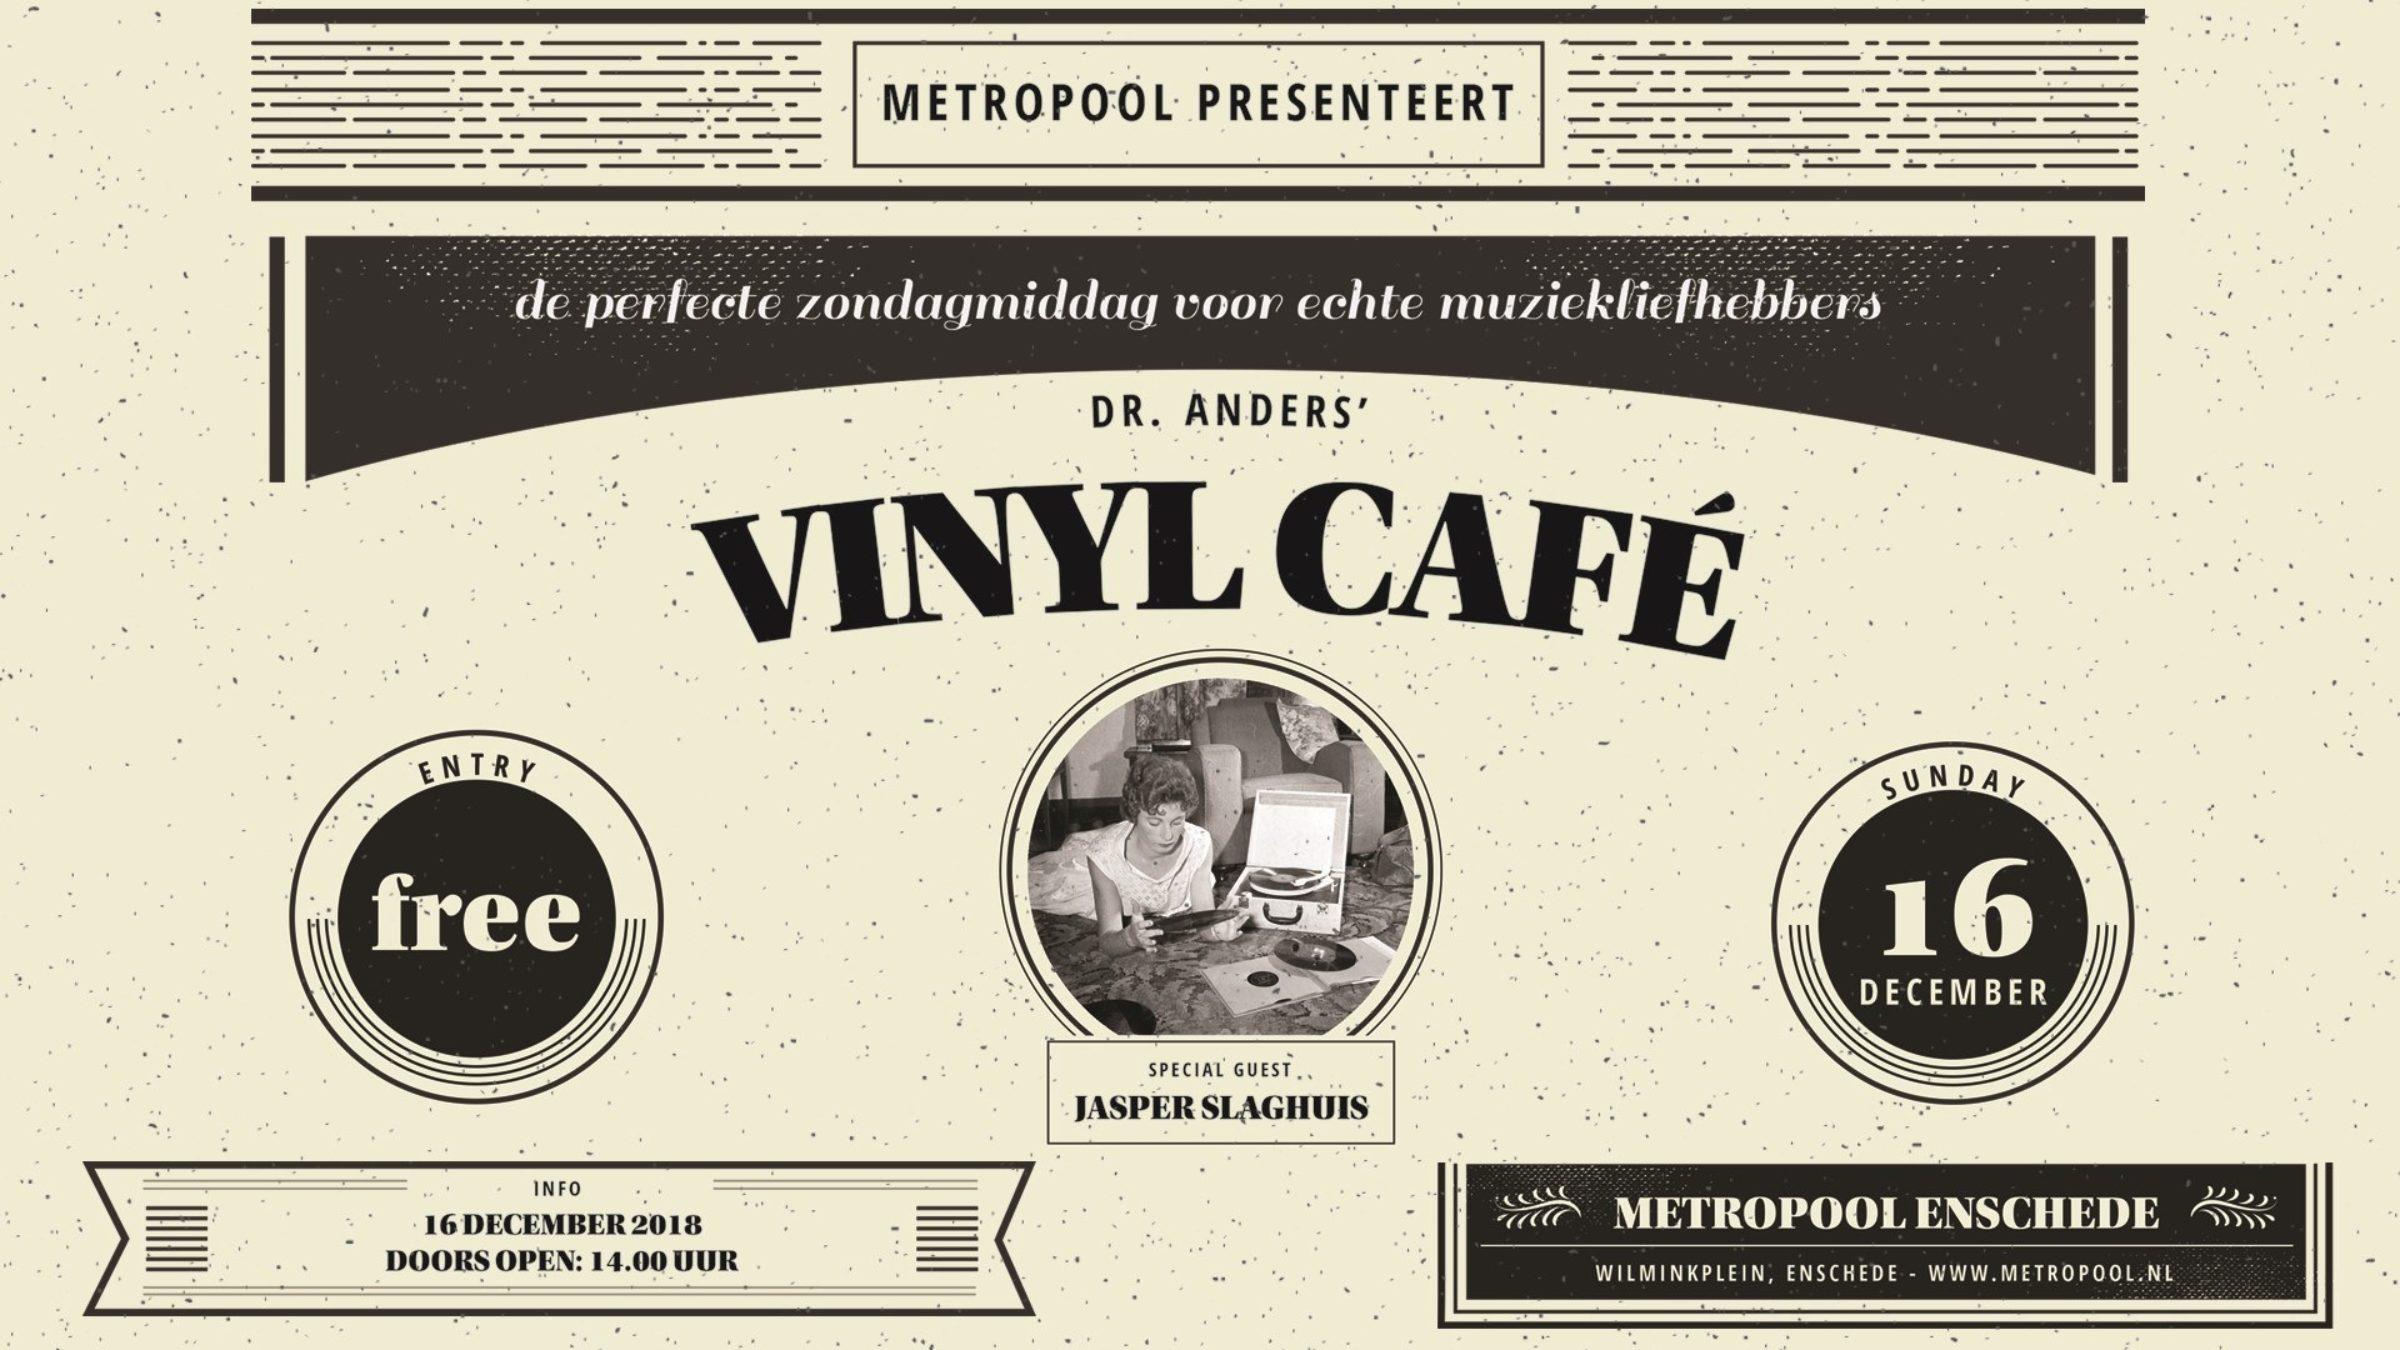 Vinyl cafe 2788 1555507514 35hxg3au4m